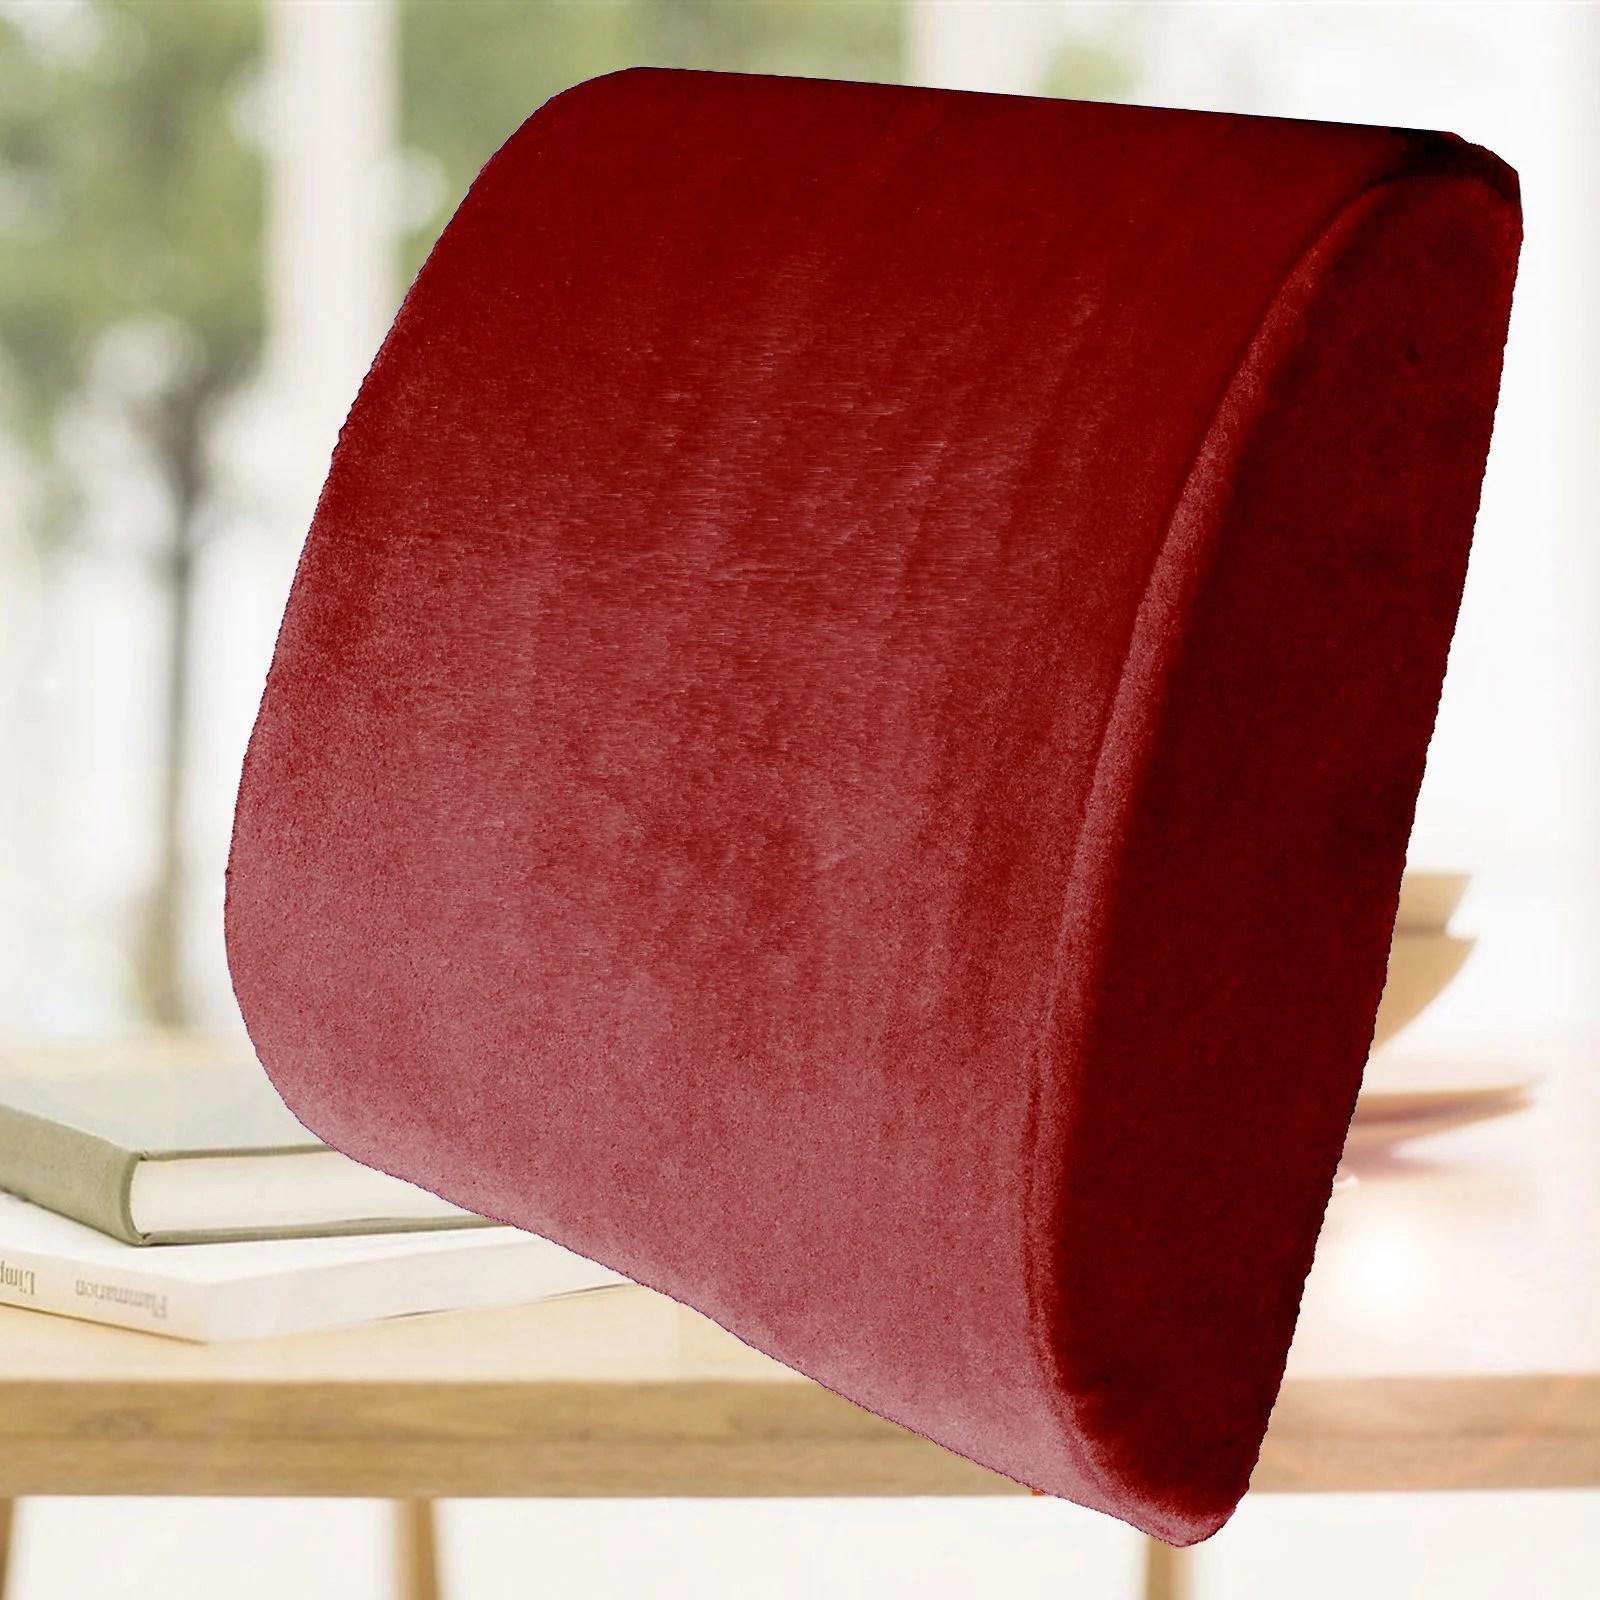 bookishbunny memory foam lumbar back support cushion pillow sciatica pain relief office chair car